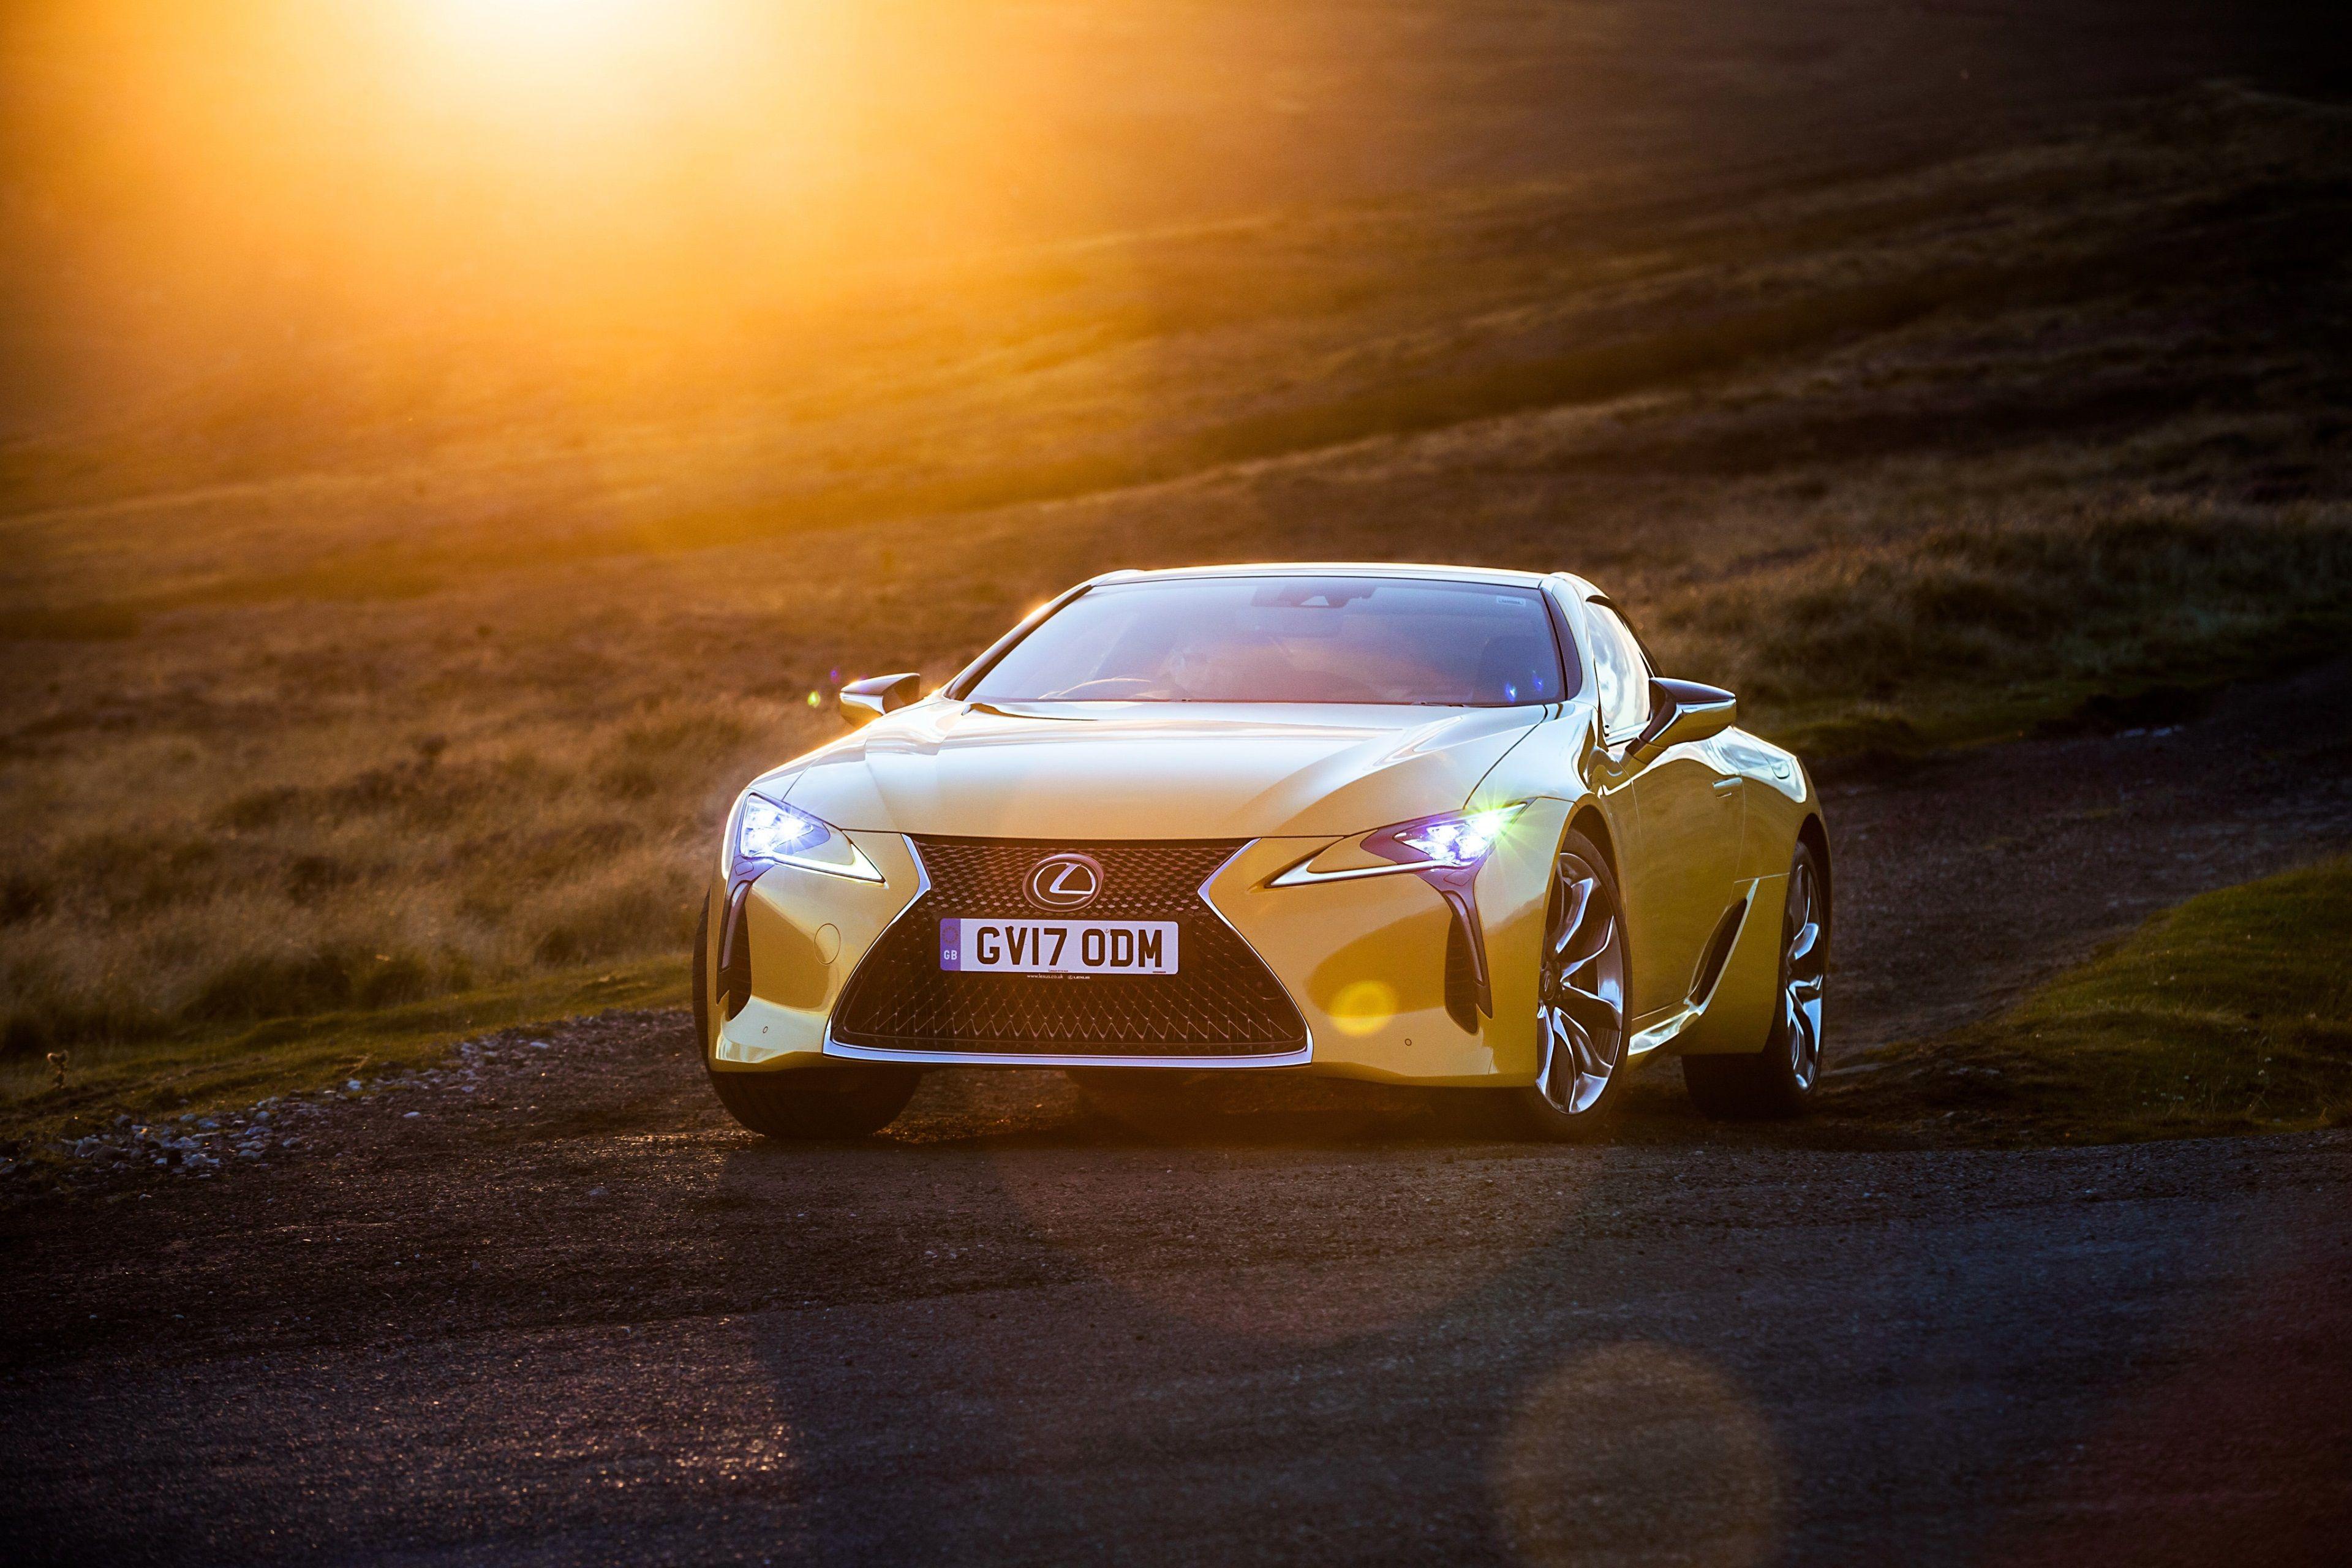 Download Wallpapers Lexus NX 300 F Sport, 2018, 4k, Black NX, Futuristic  Design, Japanese Cars, Lexus | Cars Wallpapers | Pinterest | Futuristic  Design, ...